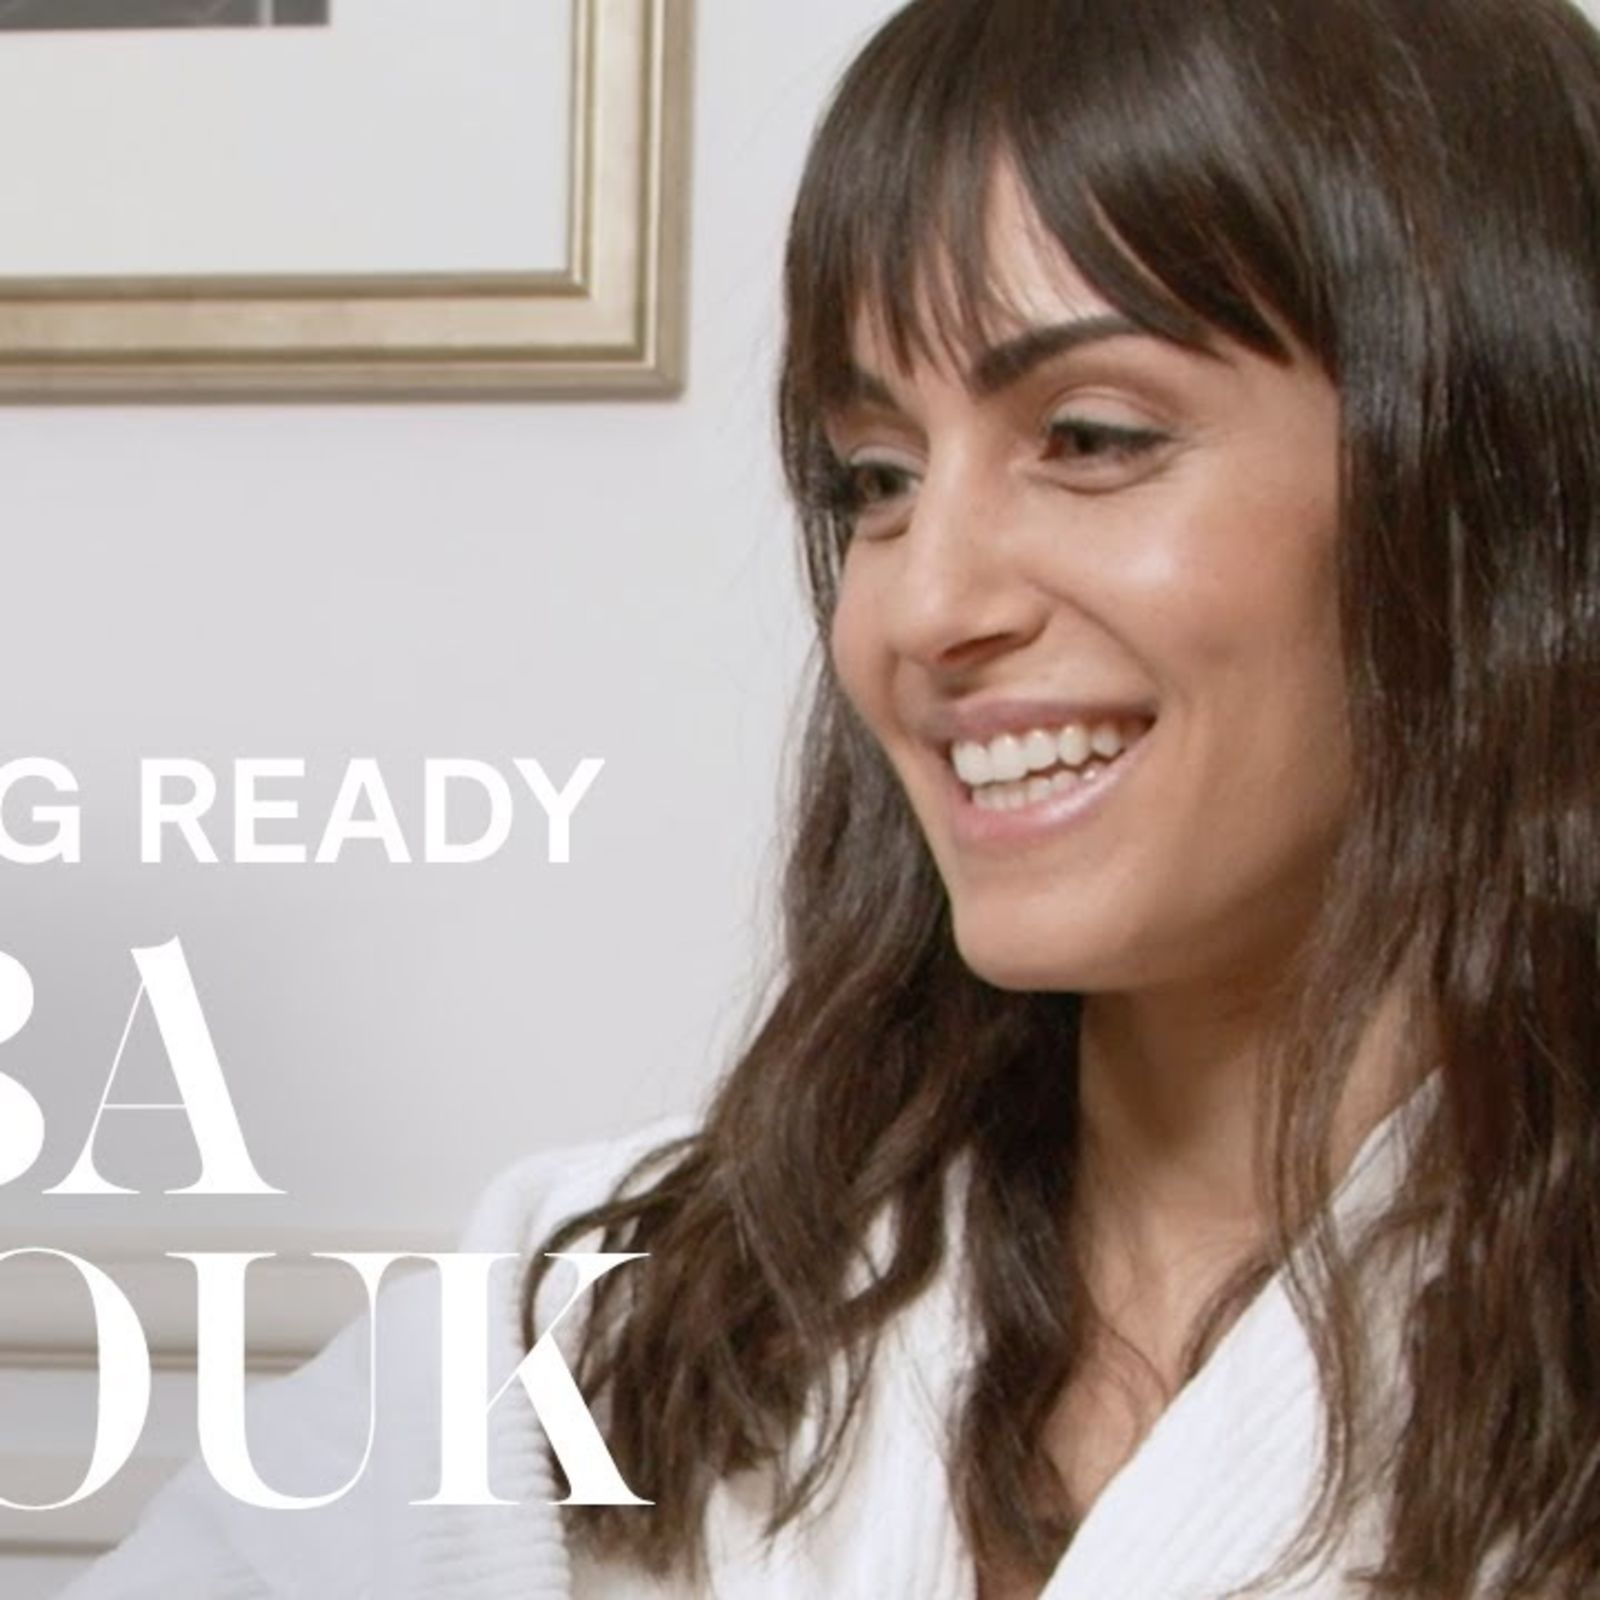 Así se preparó Hiba Abouk para los Premios Goya 2021 | Getting ready